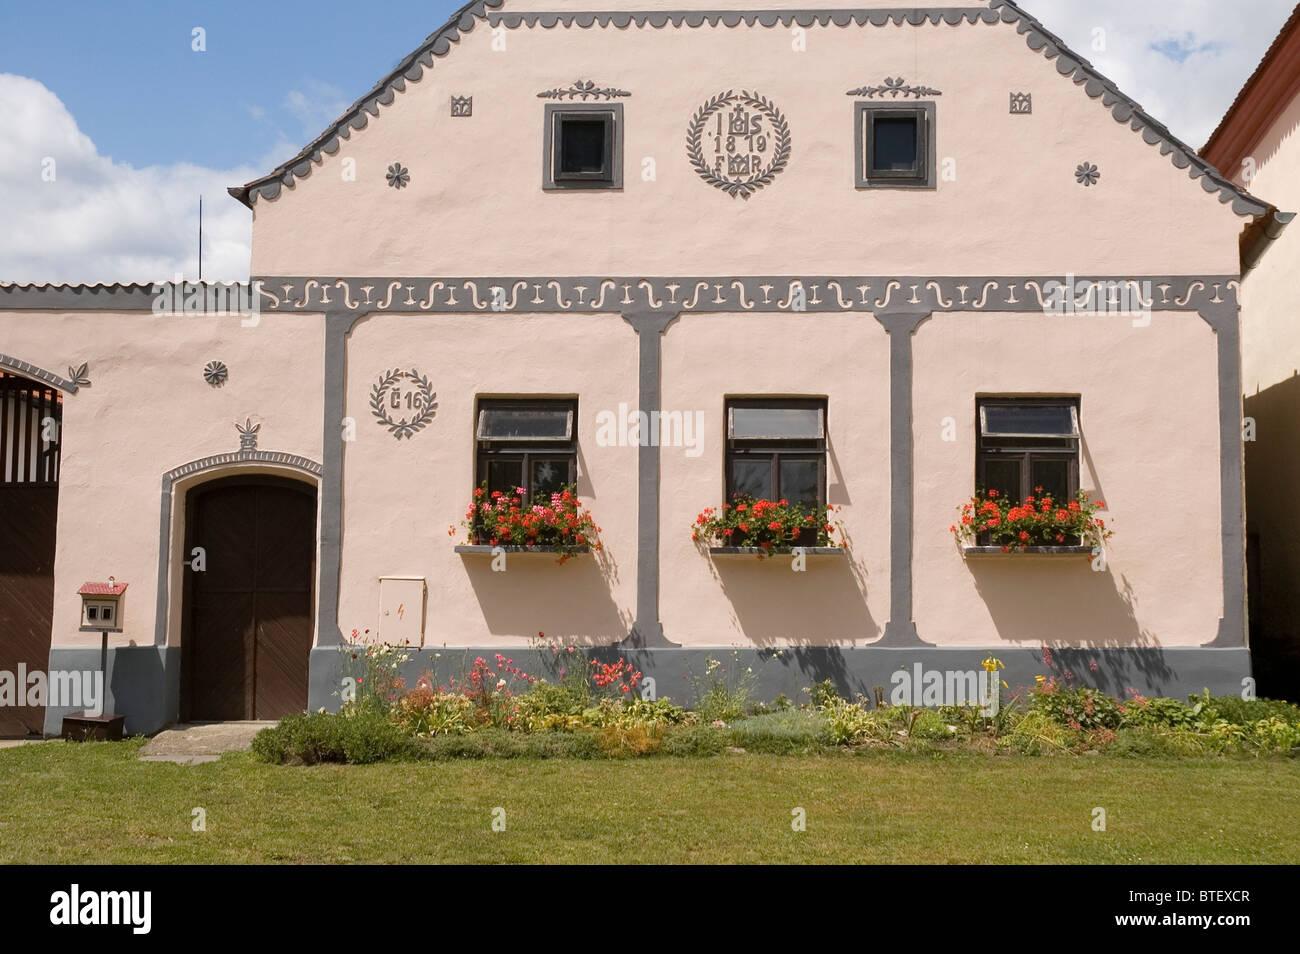 Elk188-2892 Czech Republic, Holasovice, folk baroque farmhouse, pink decorated farmhouse - Stock Image